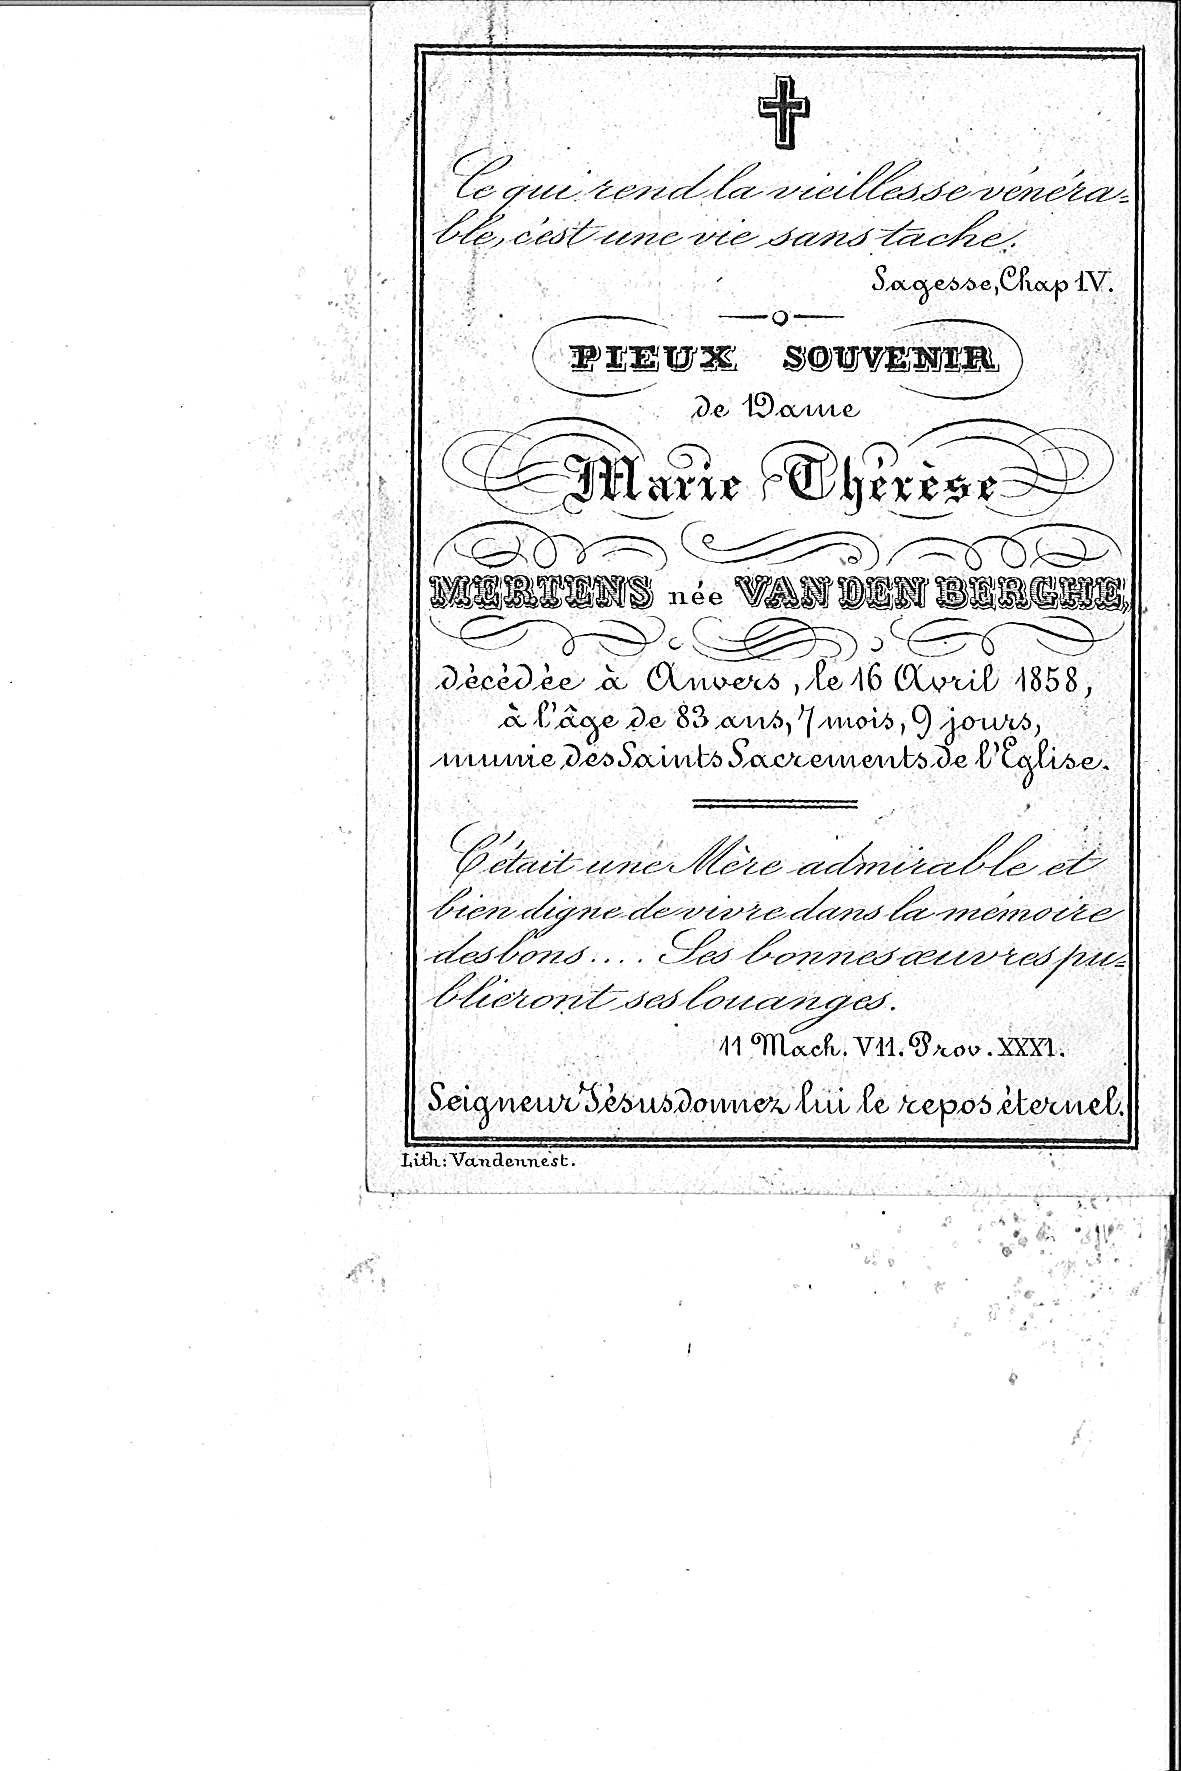 Marie_Thérése(1858)20150804084944_00055.jpg